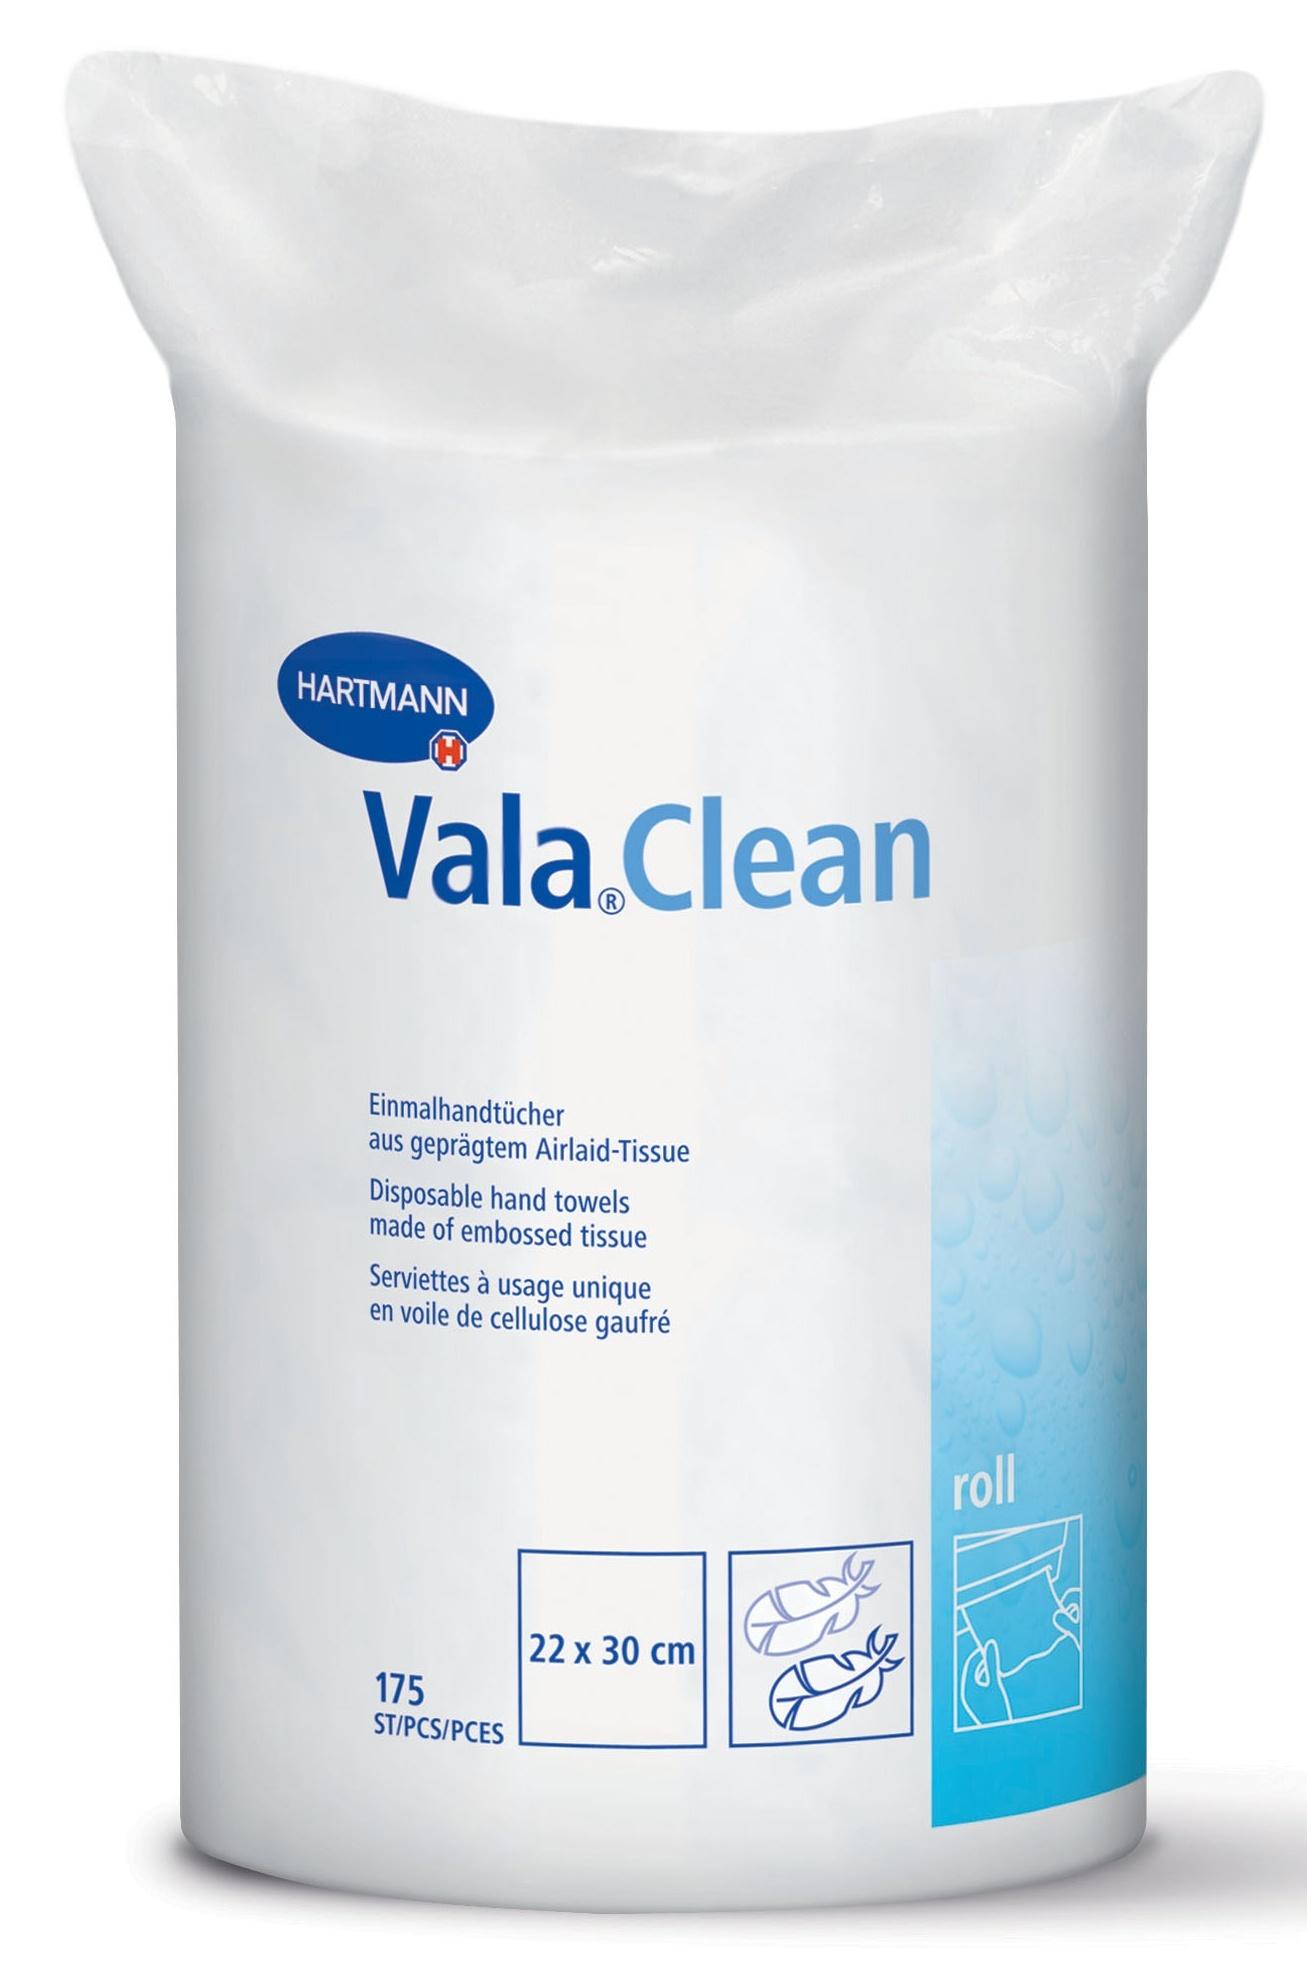 ValaClean Roll ručníky 22 × 30 cm 175 ks